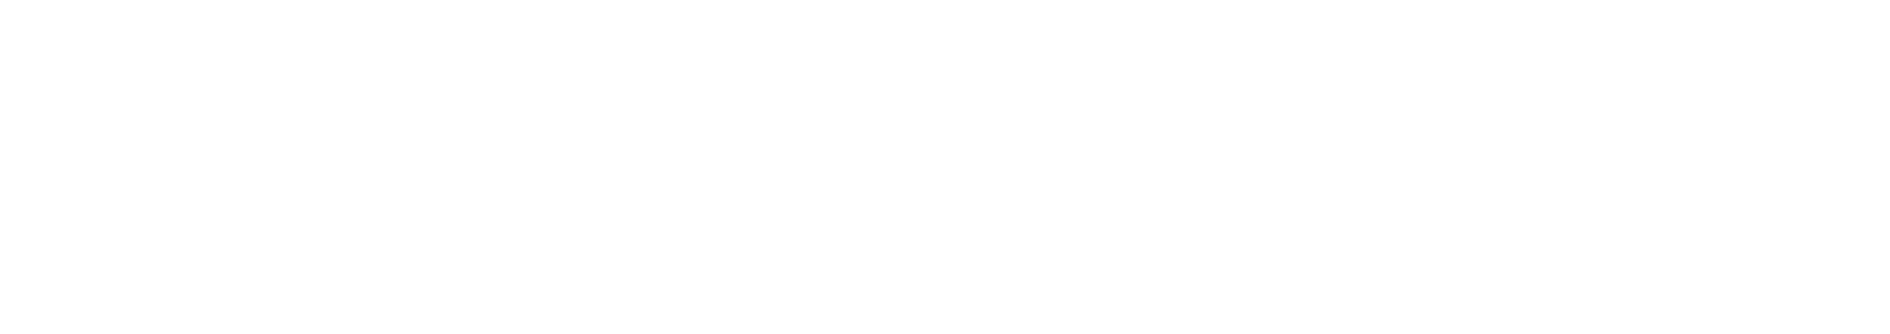 Nextworkx GmbH